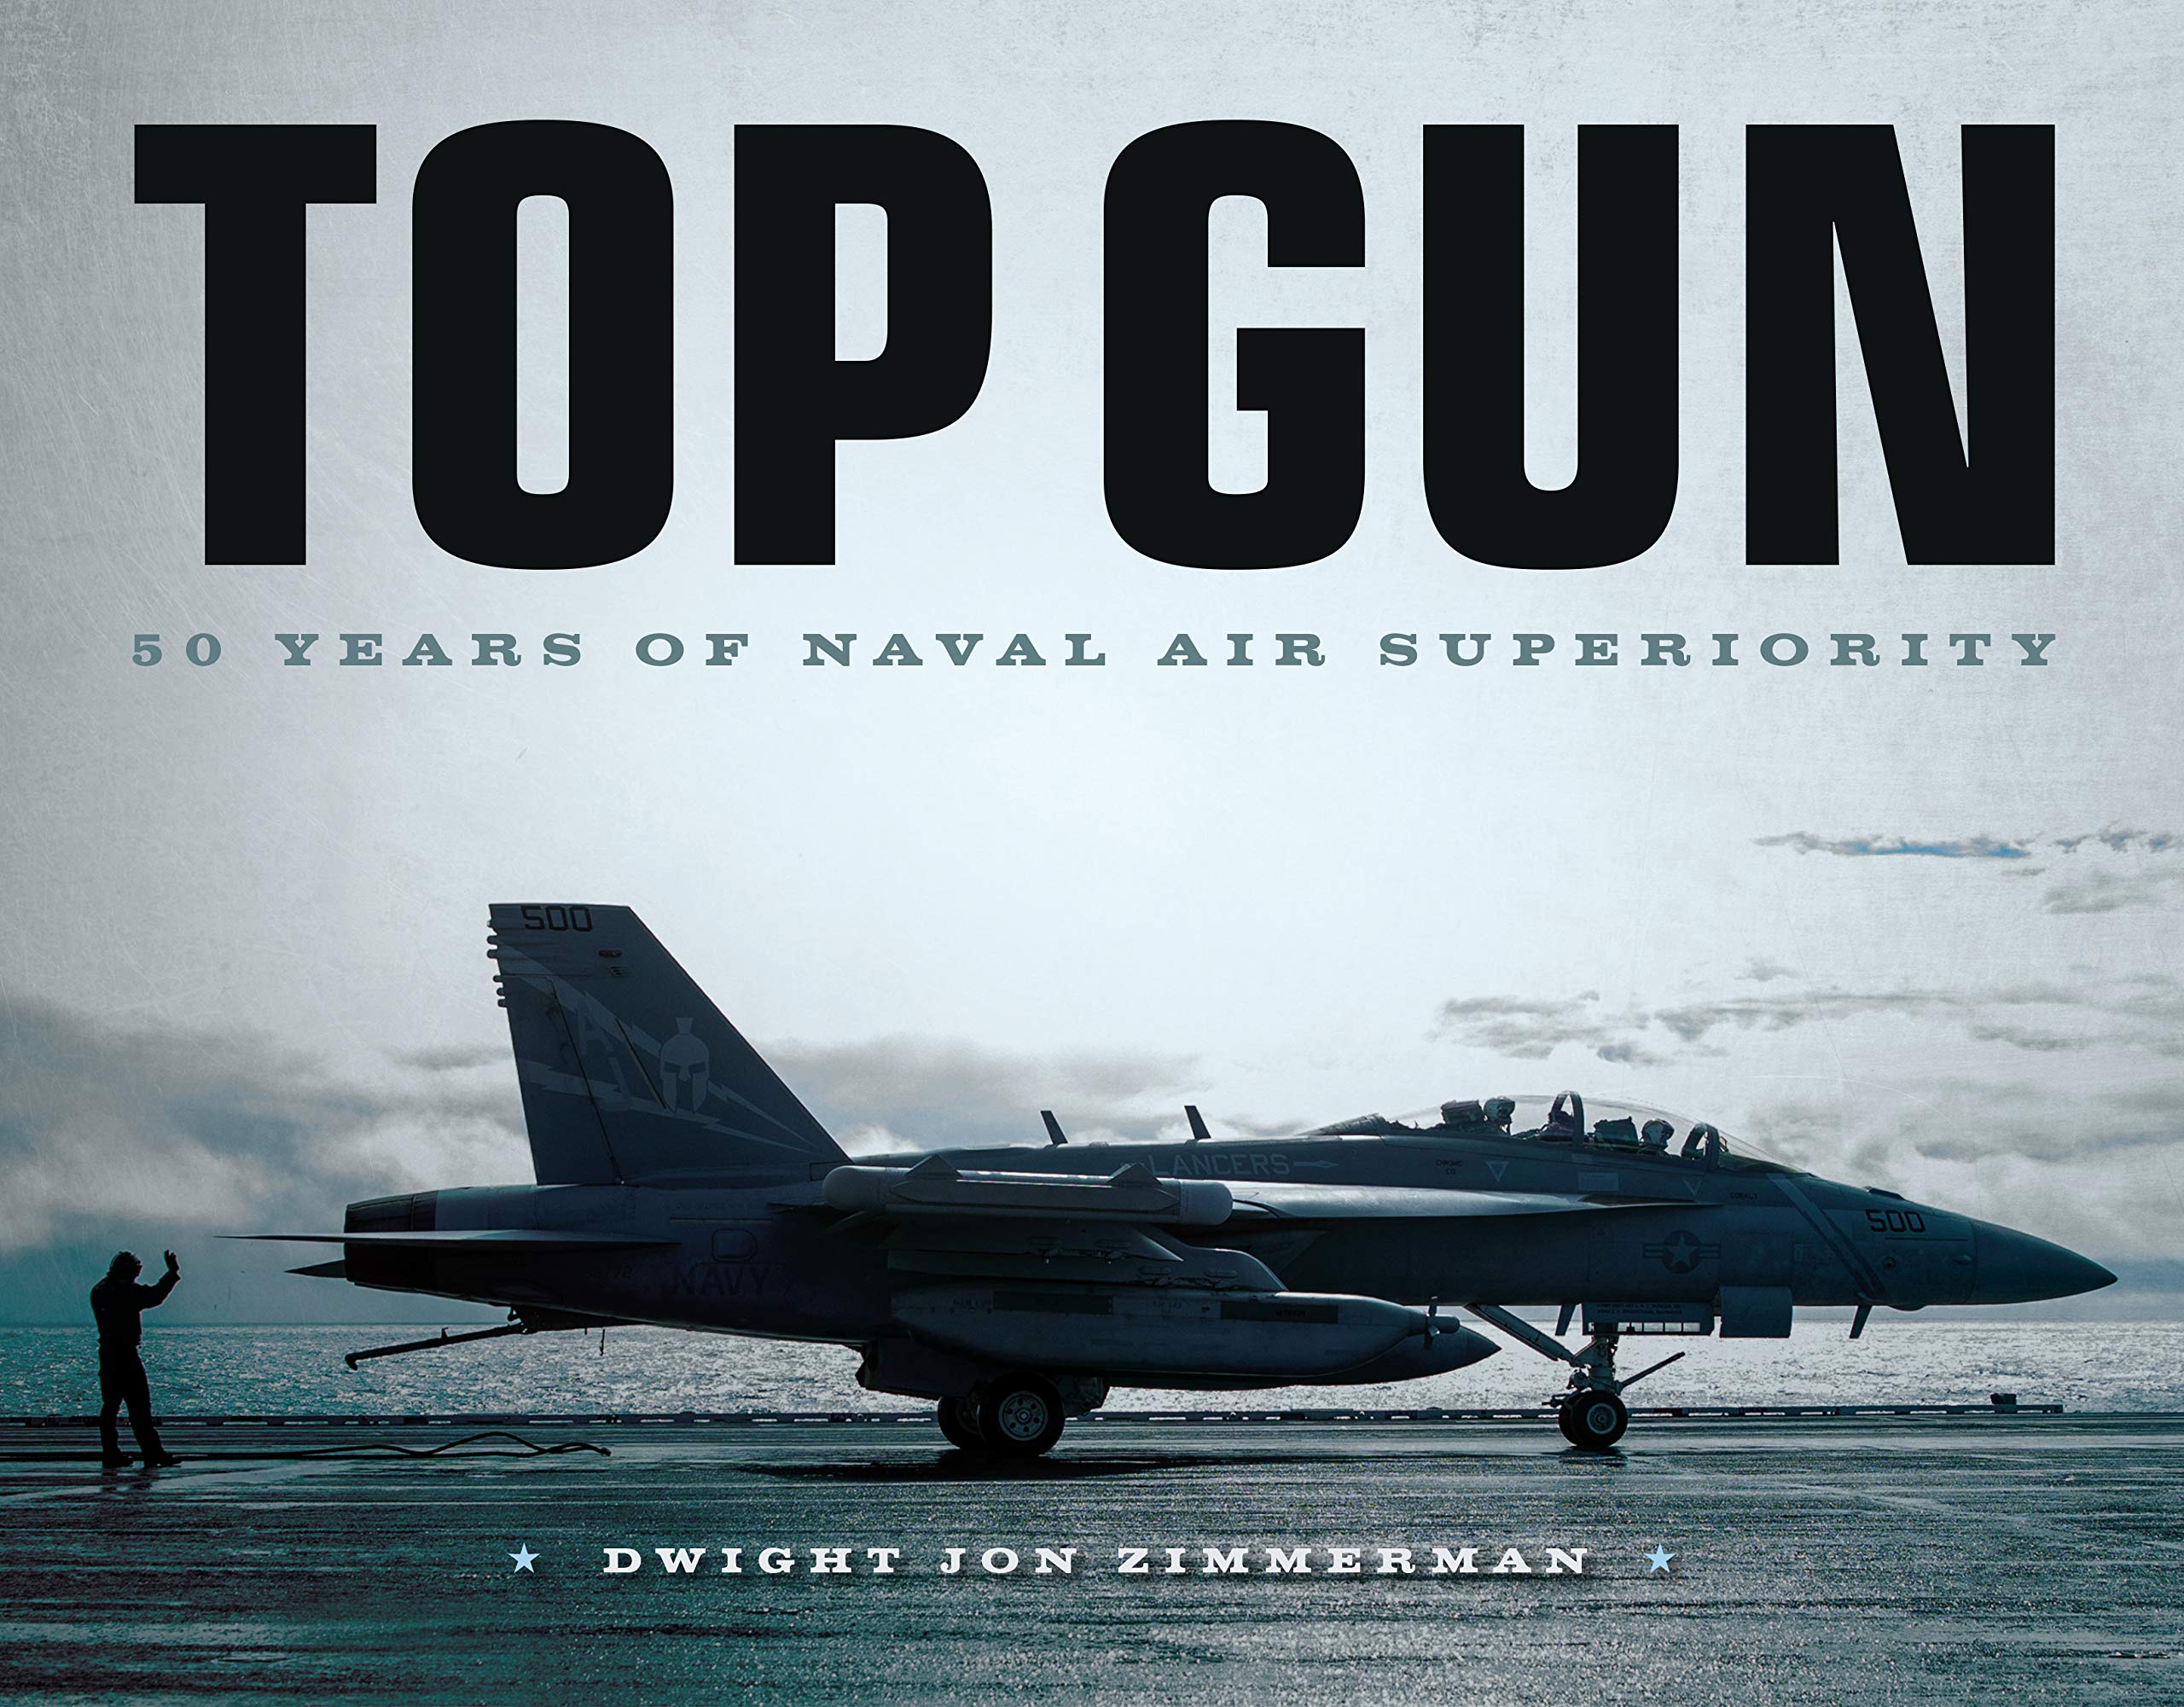 2d970e272 Top Gun  50 Years of Naval Air Superiority  Dwight Jon Zimmerman ...